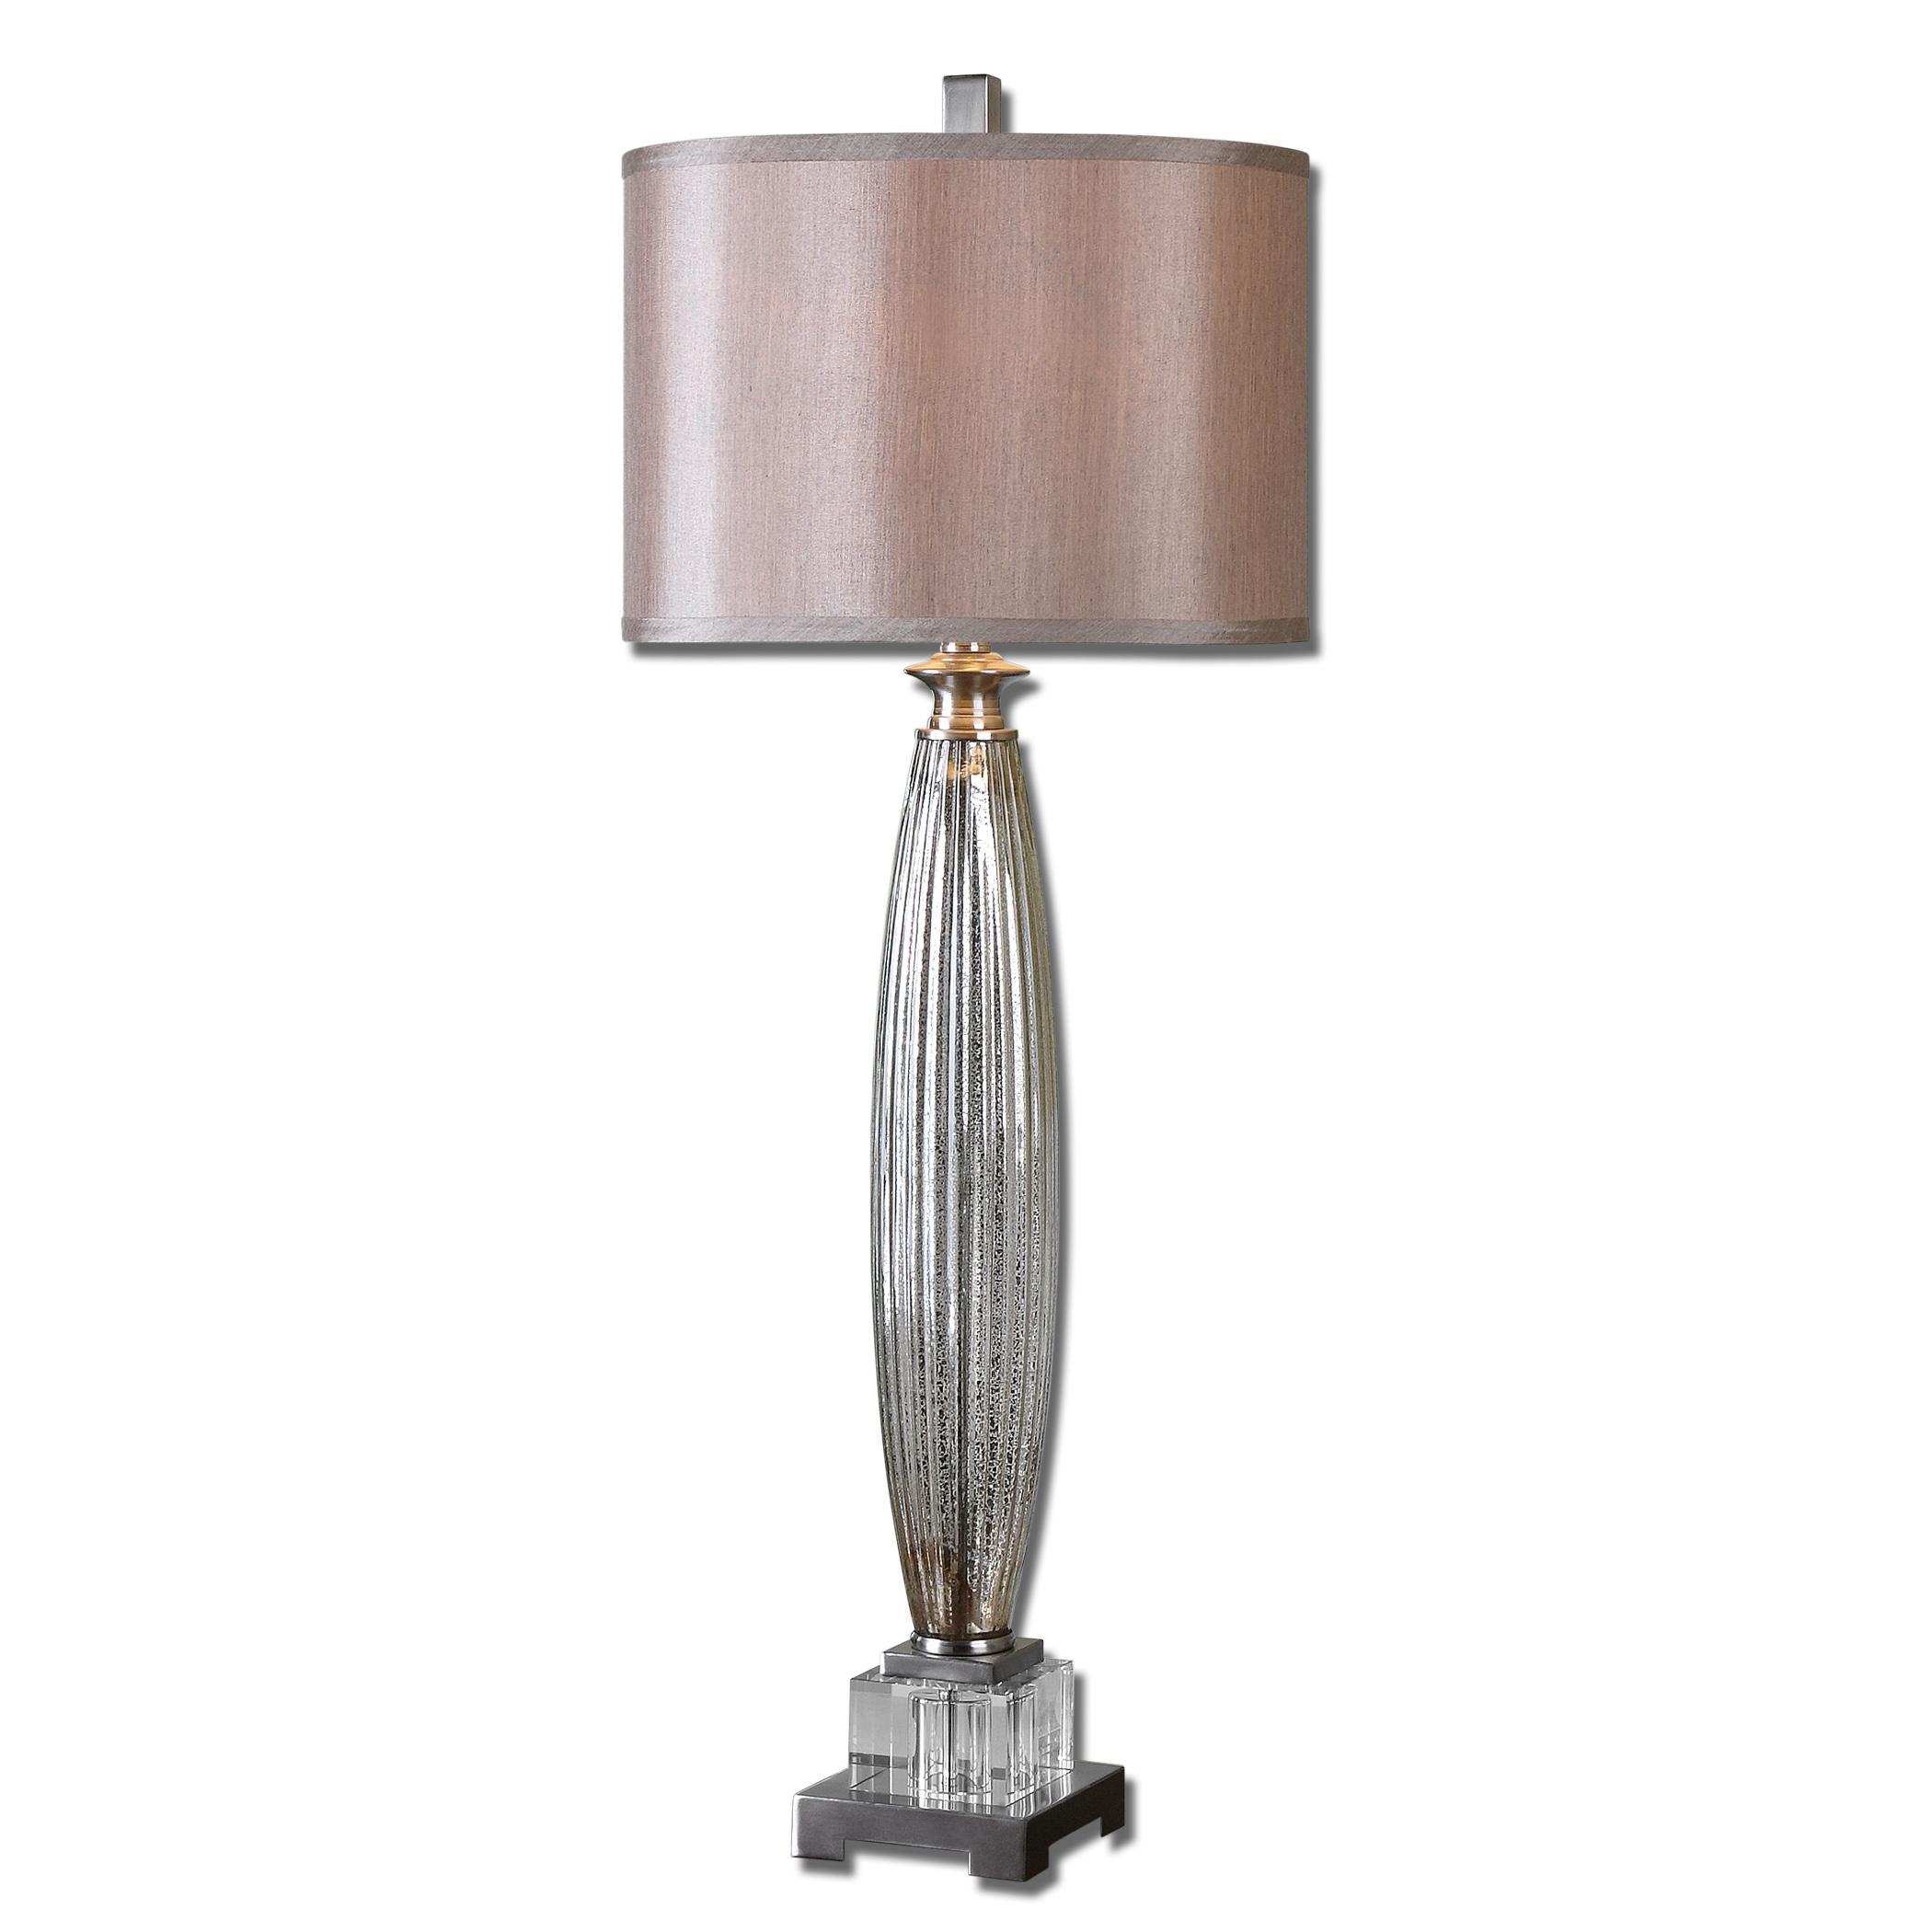 Loredo Mercury Glass Table Lamp